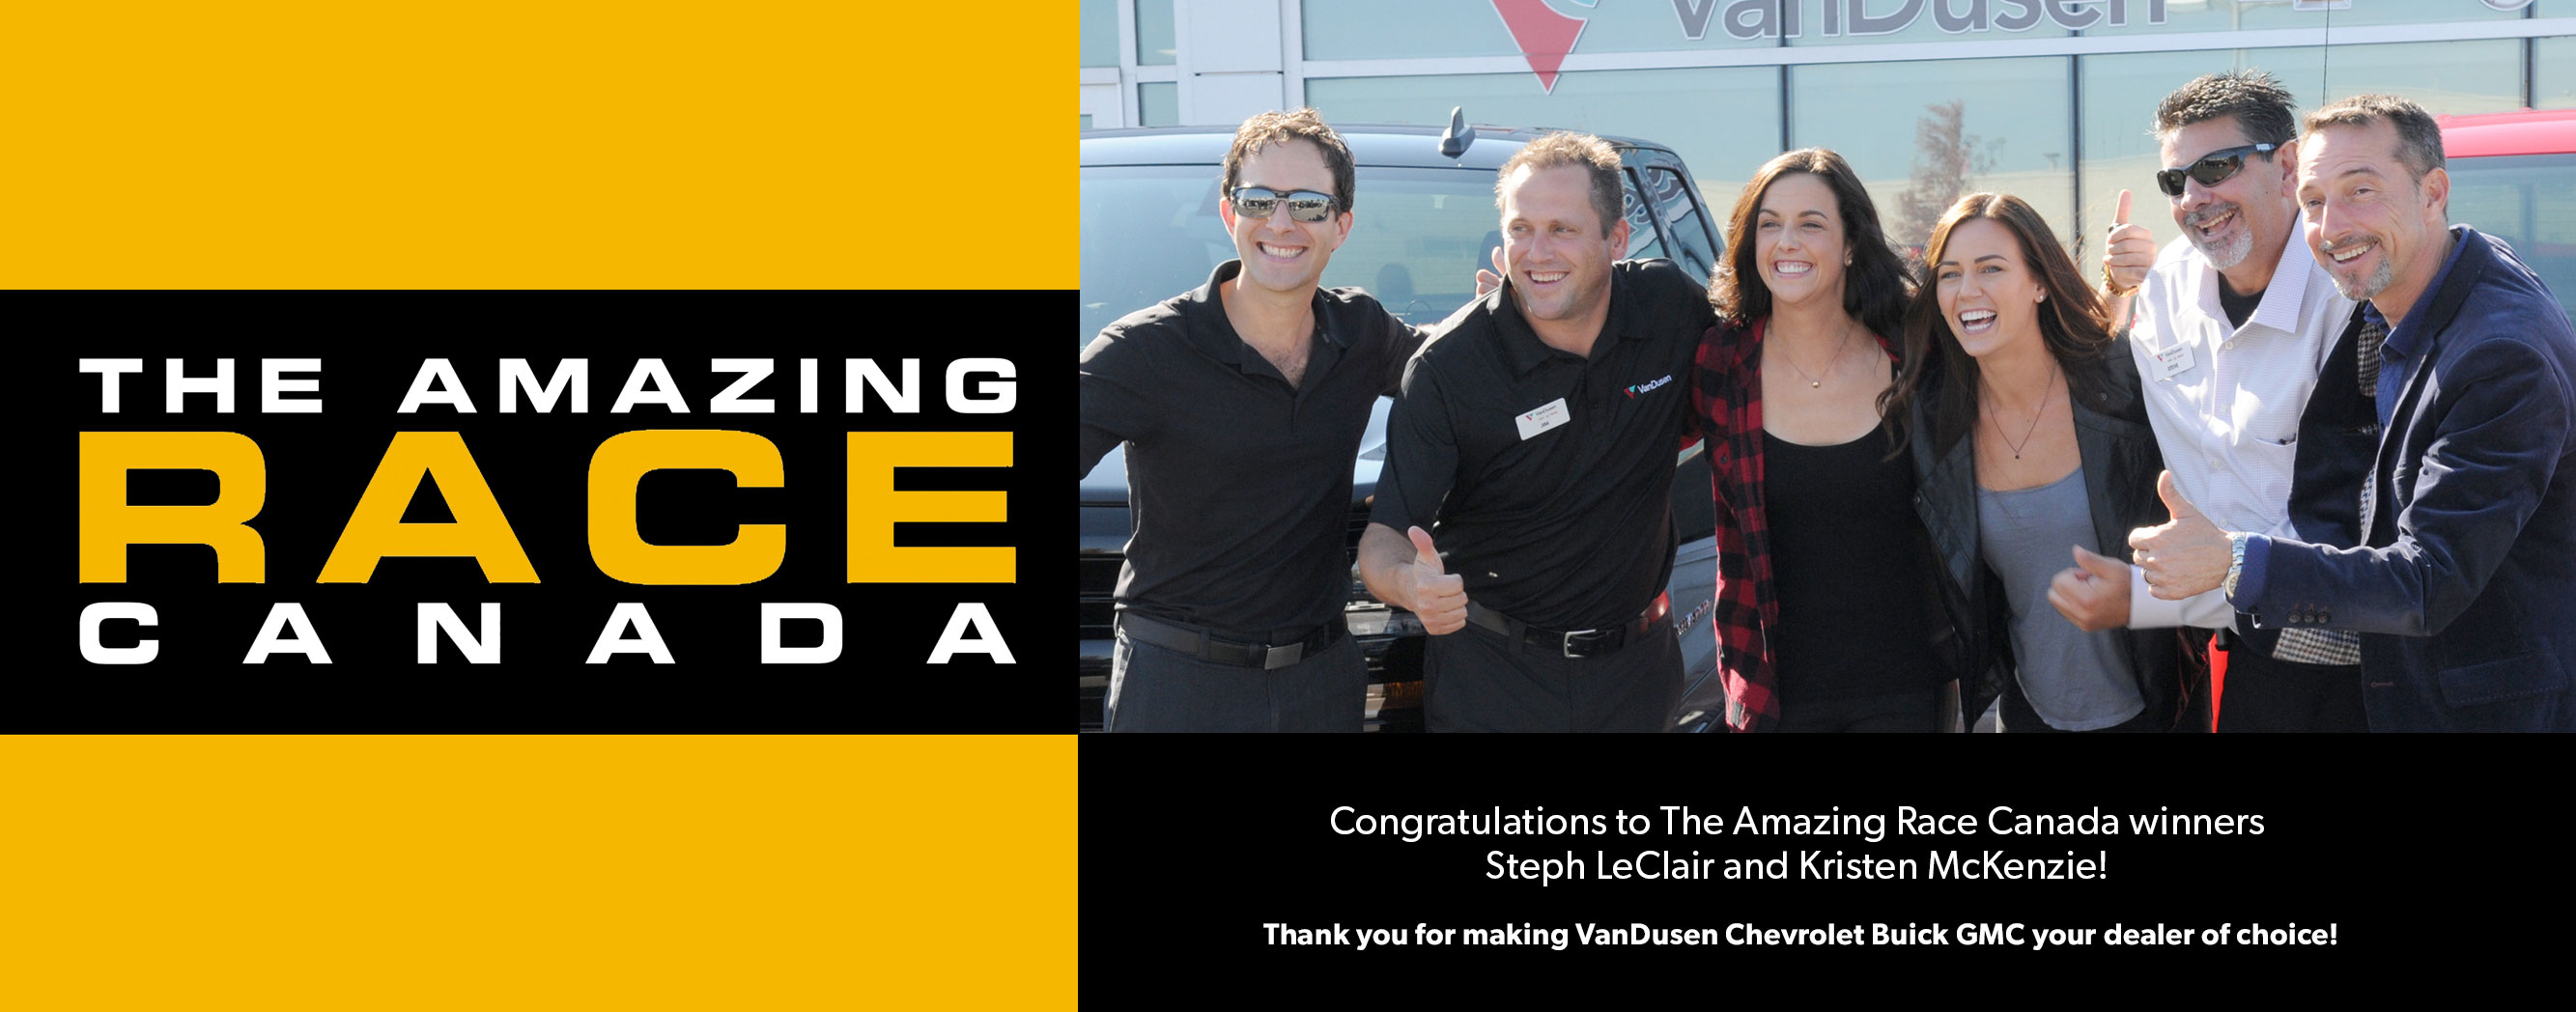 VanDusen Chevrolet Buick GMC The Amazing Race Canada winners,  Steph Leclair Kristen McKenzie.